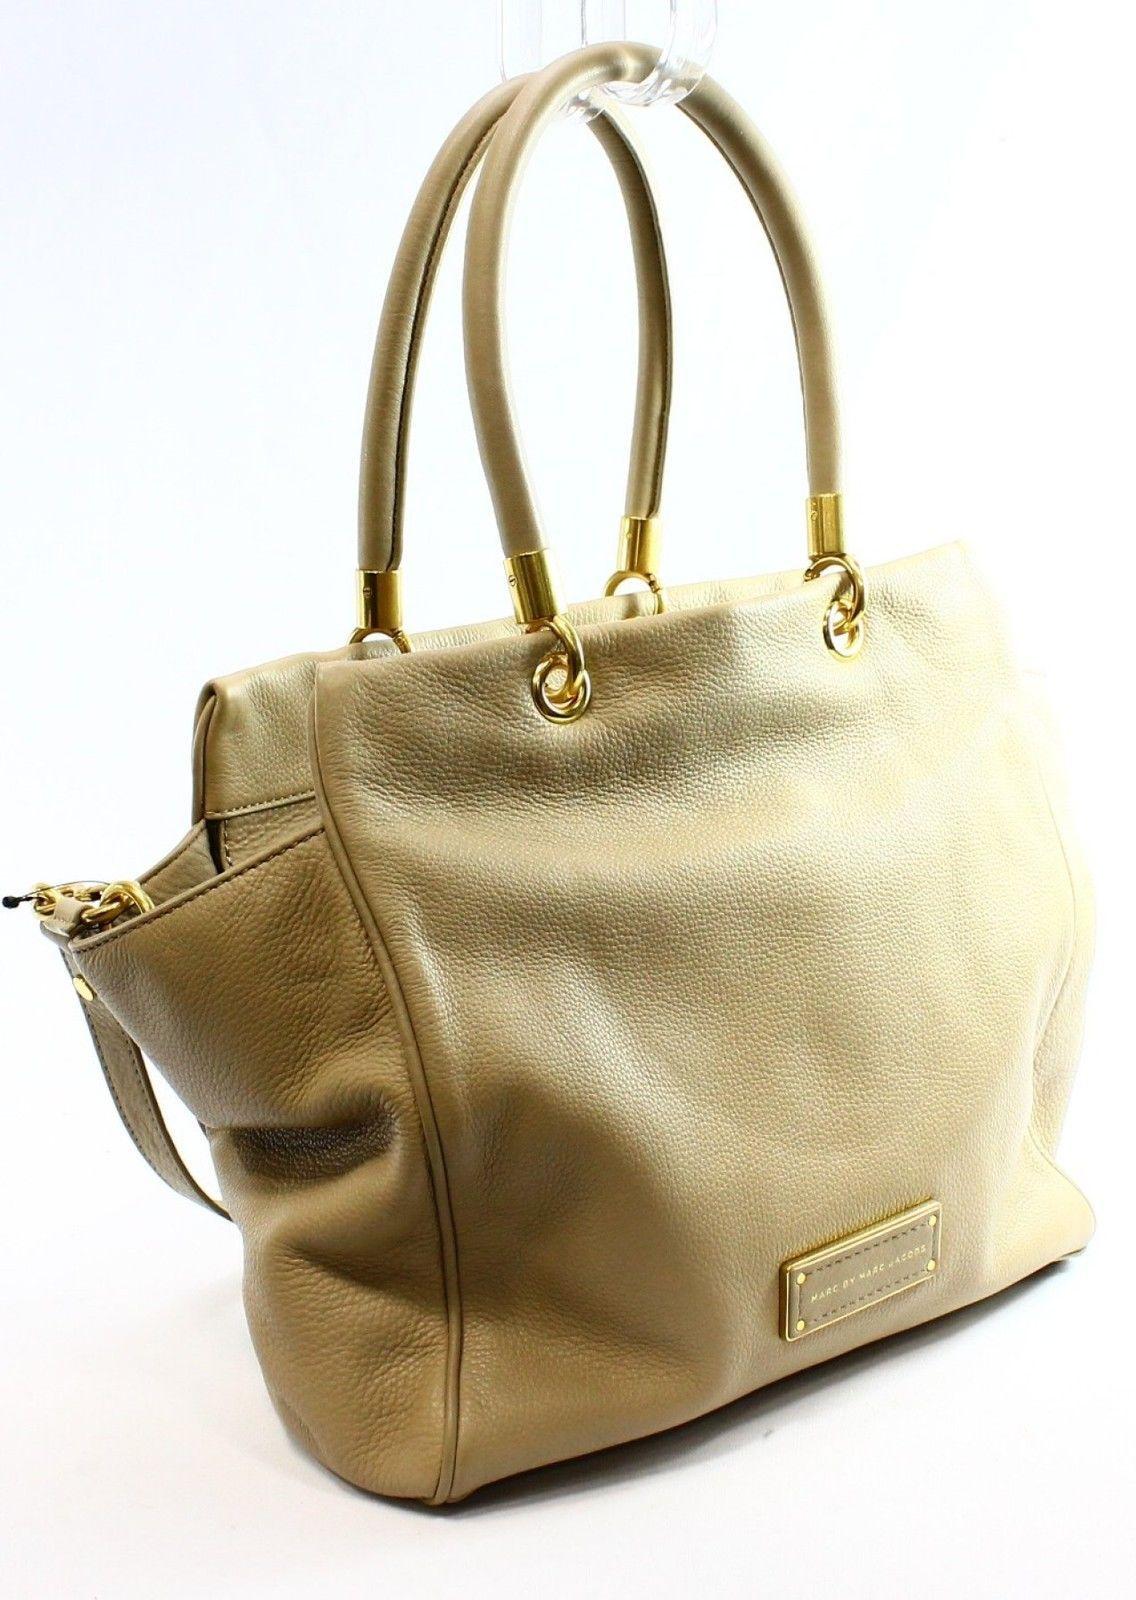 bentley bags leather messenger bag for women adidas messenger bag